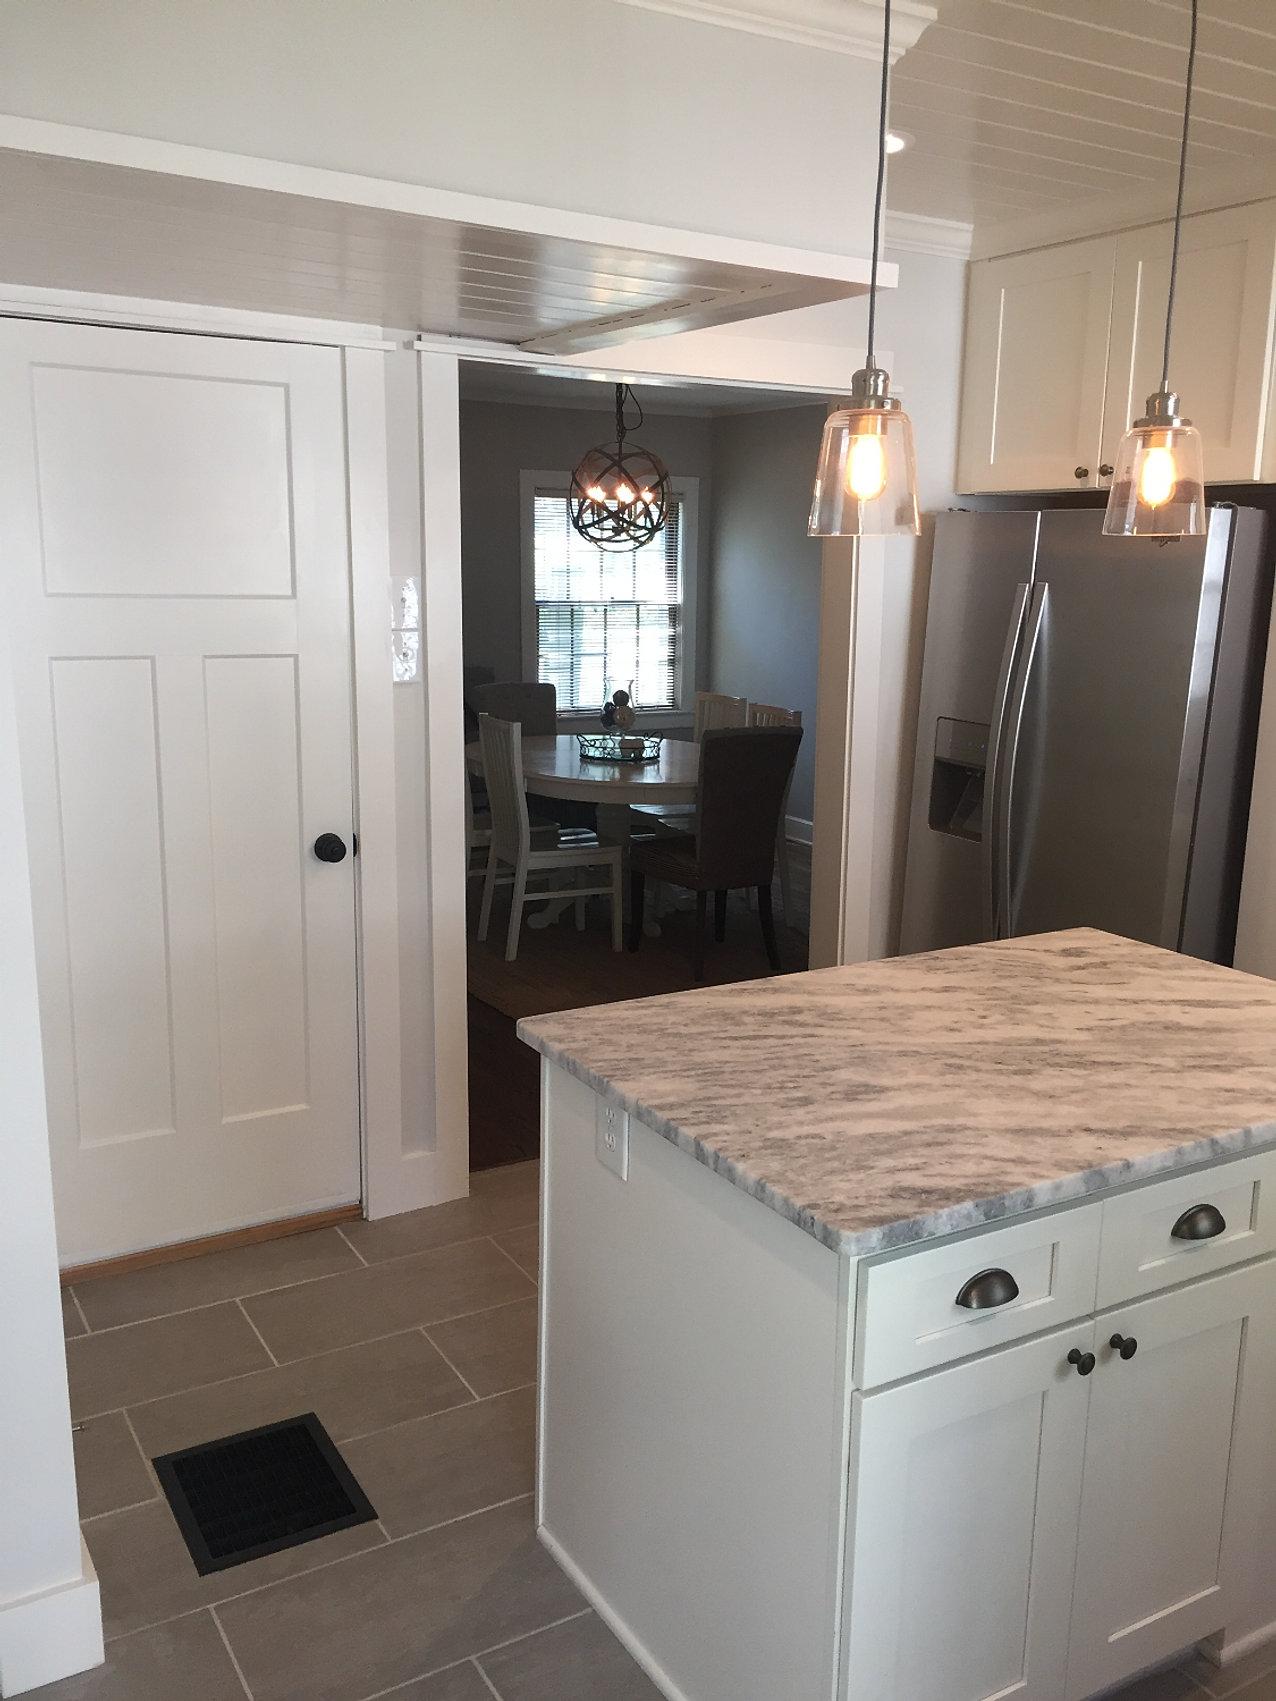 Kitchen Remodeling Knoxville Tn Detritus - Kitchen remodeling knoxville tn